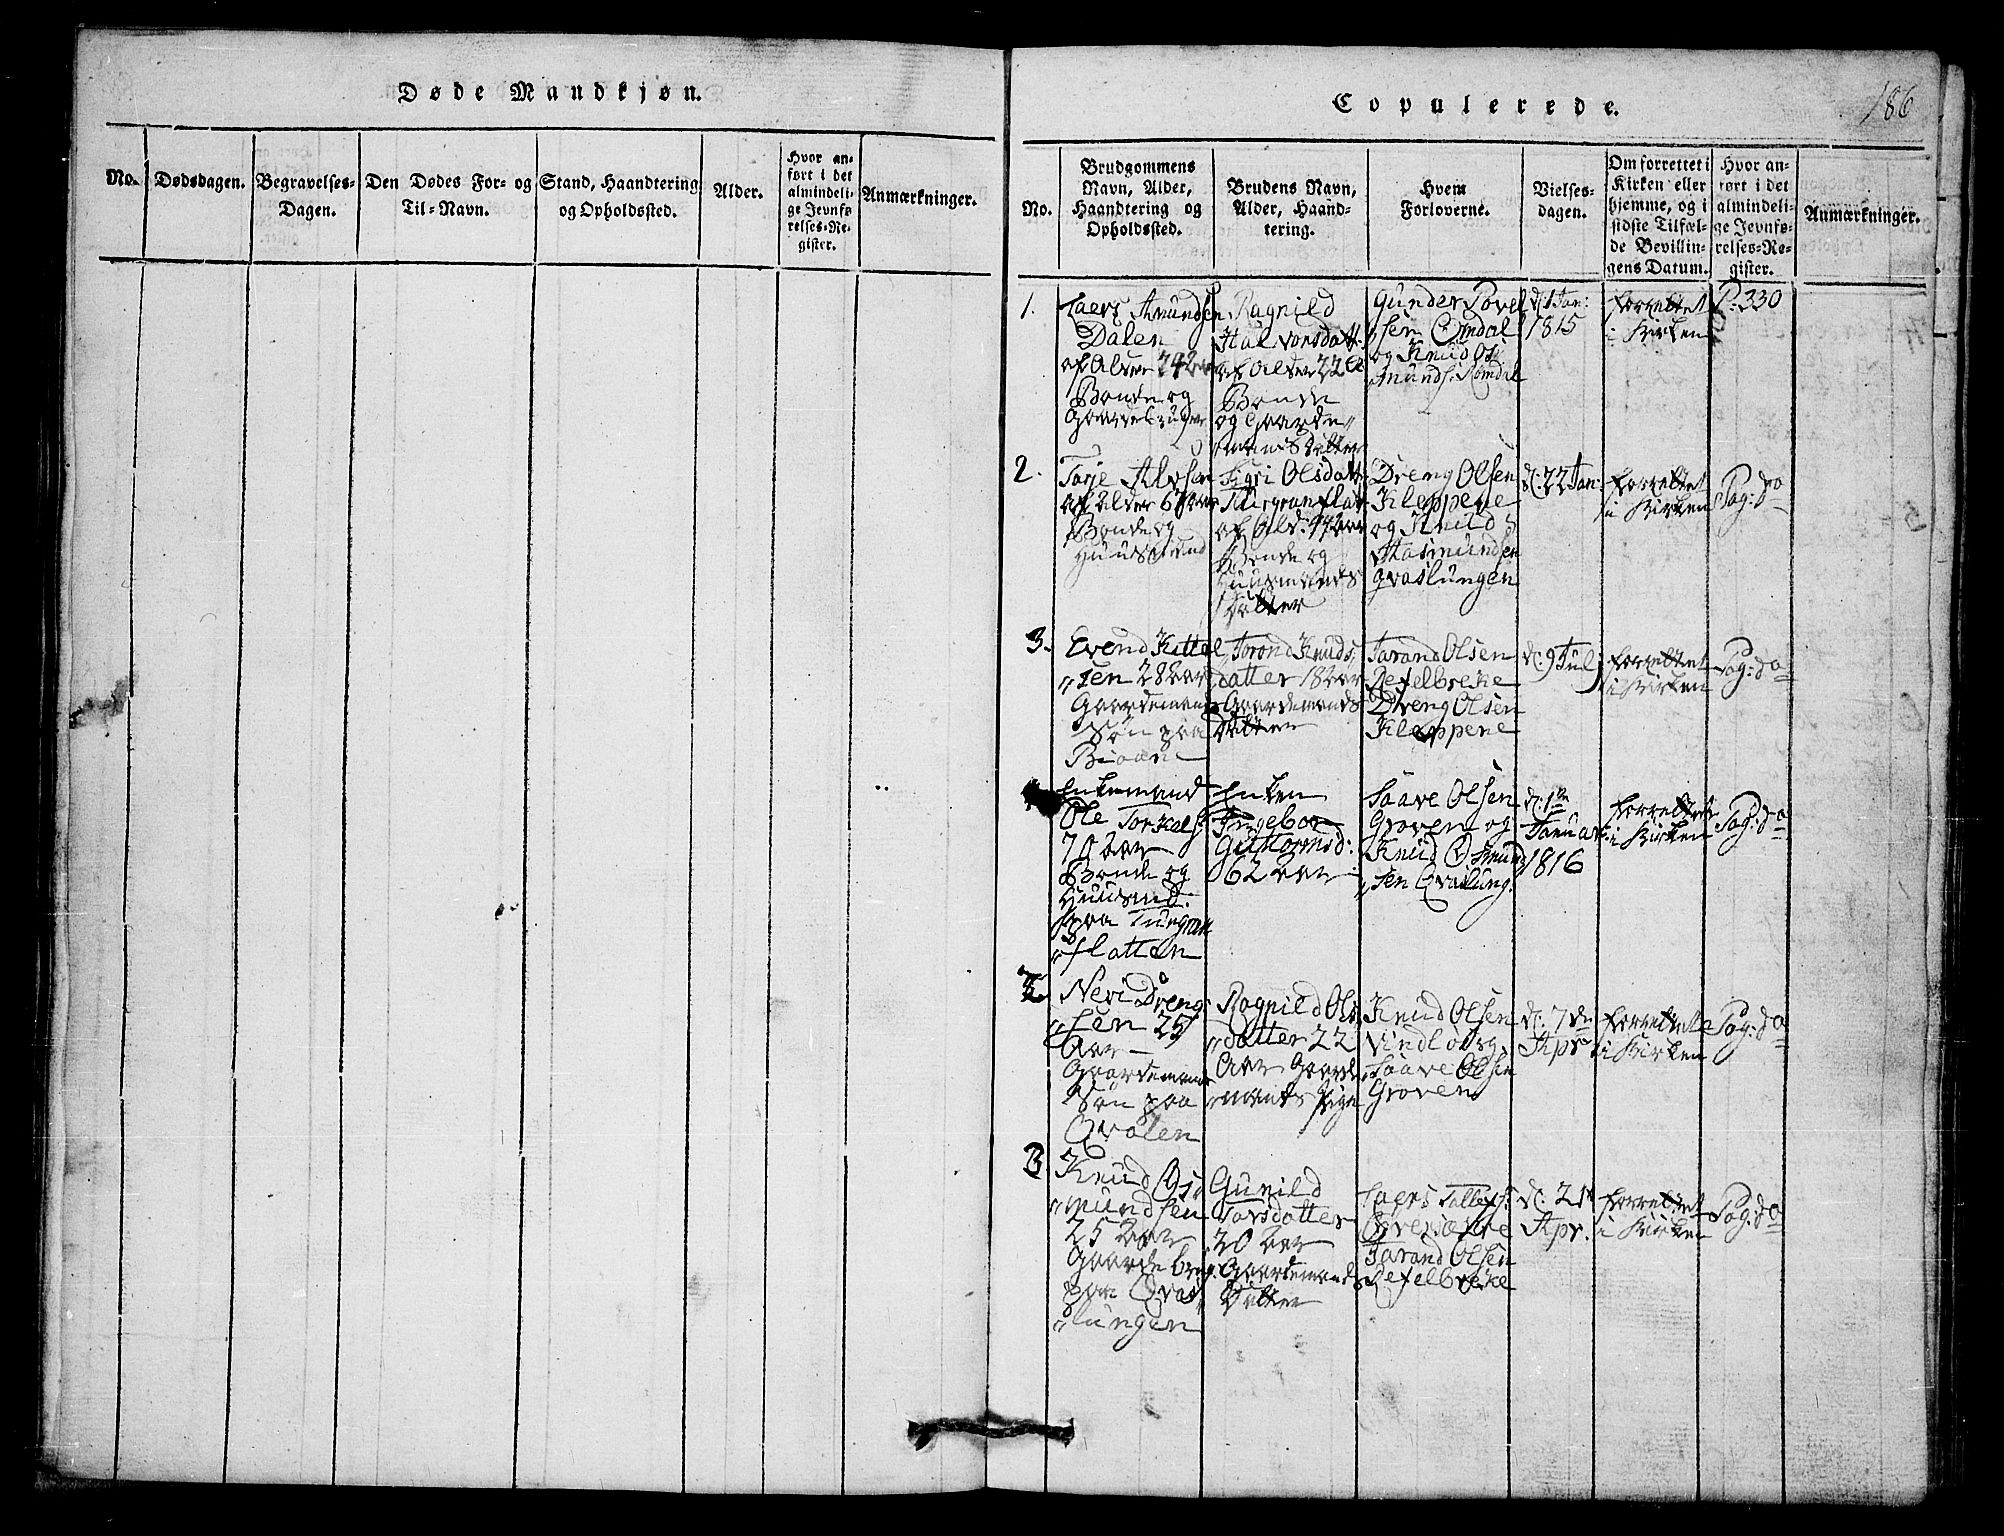 SAKO, Lårdal kirkebøker, G/Gb/L0001: Klokkerbok nr. II 1, 1815-1865, s. 186